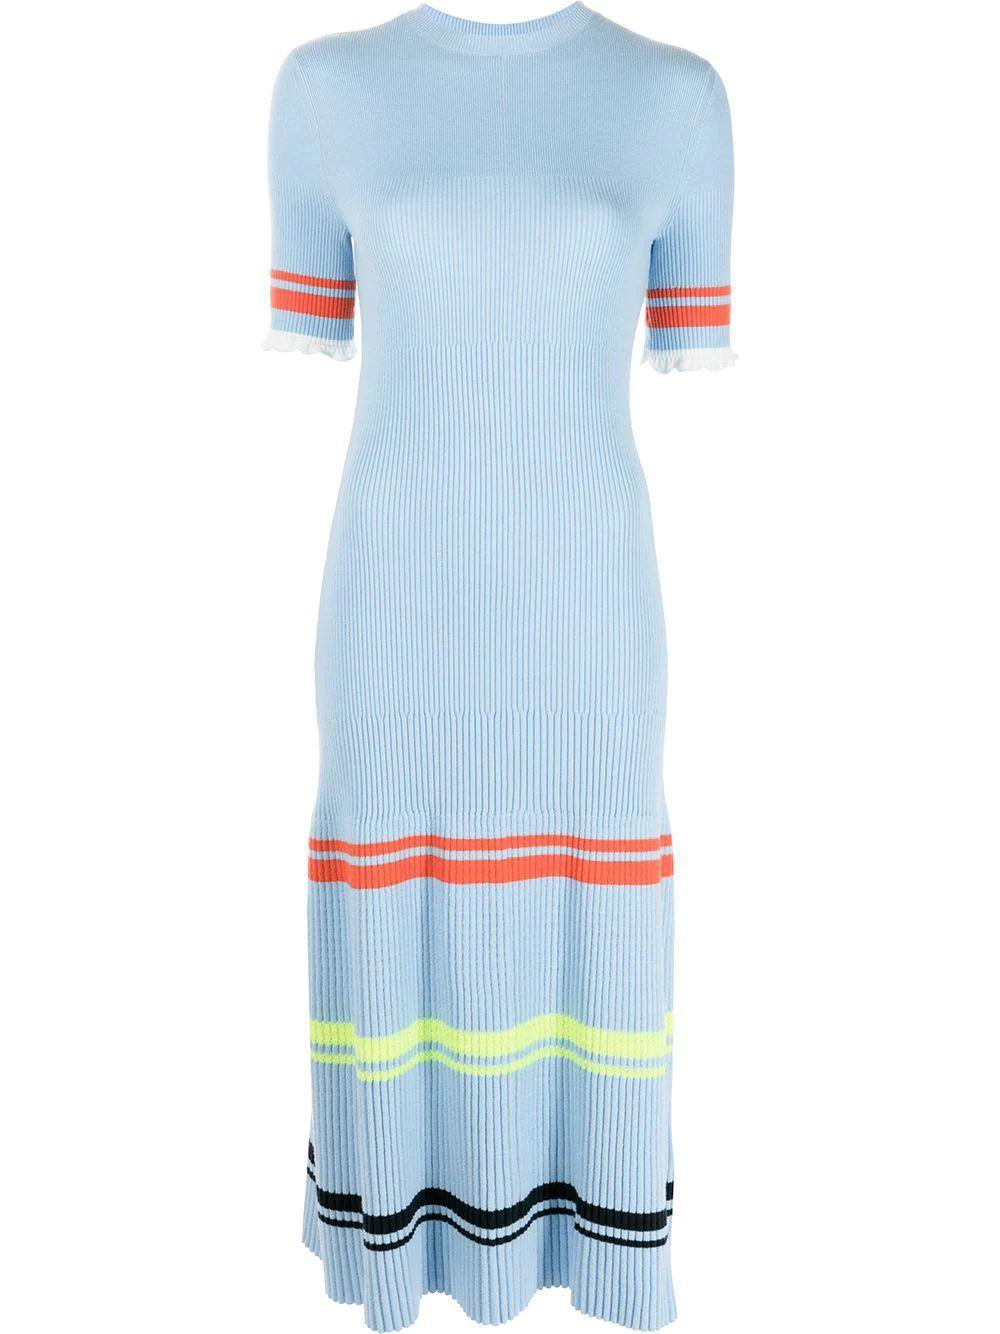 Striped Knit Summer Dress